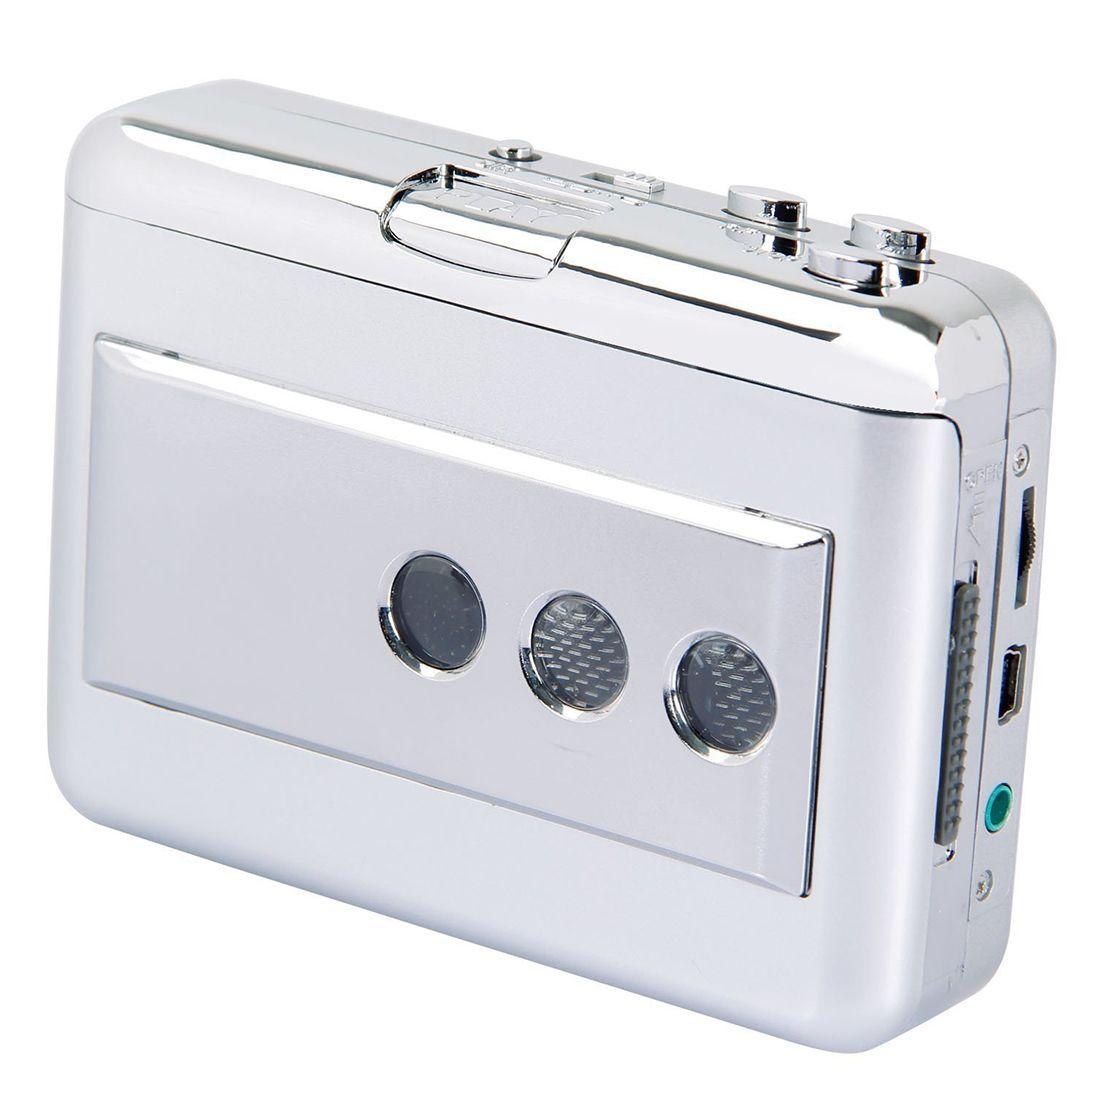 Clever Tragbare Cassette Recorder & Spieler Usb Band Pc Super Mp3 Musik Player Audio Converter Recorder Spieler Cassette-to-mp3 Unterhaltungselektronik Heim-audio & Video